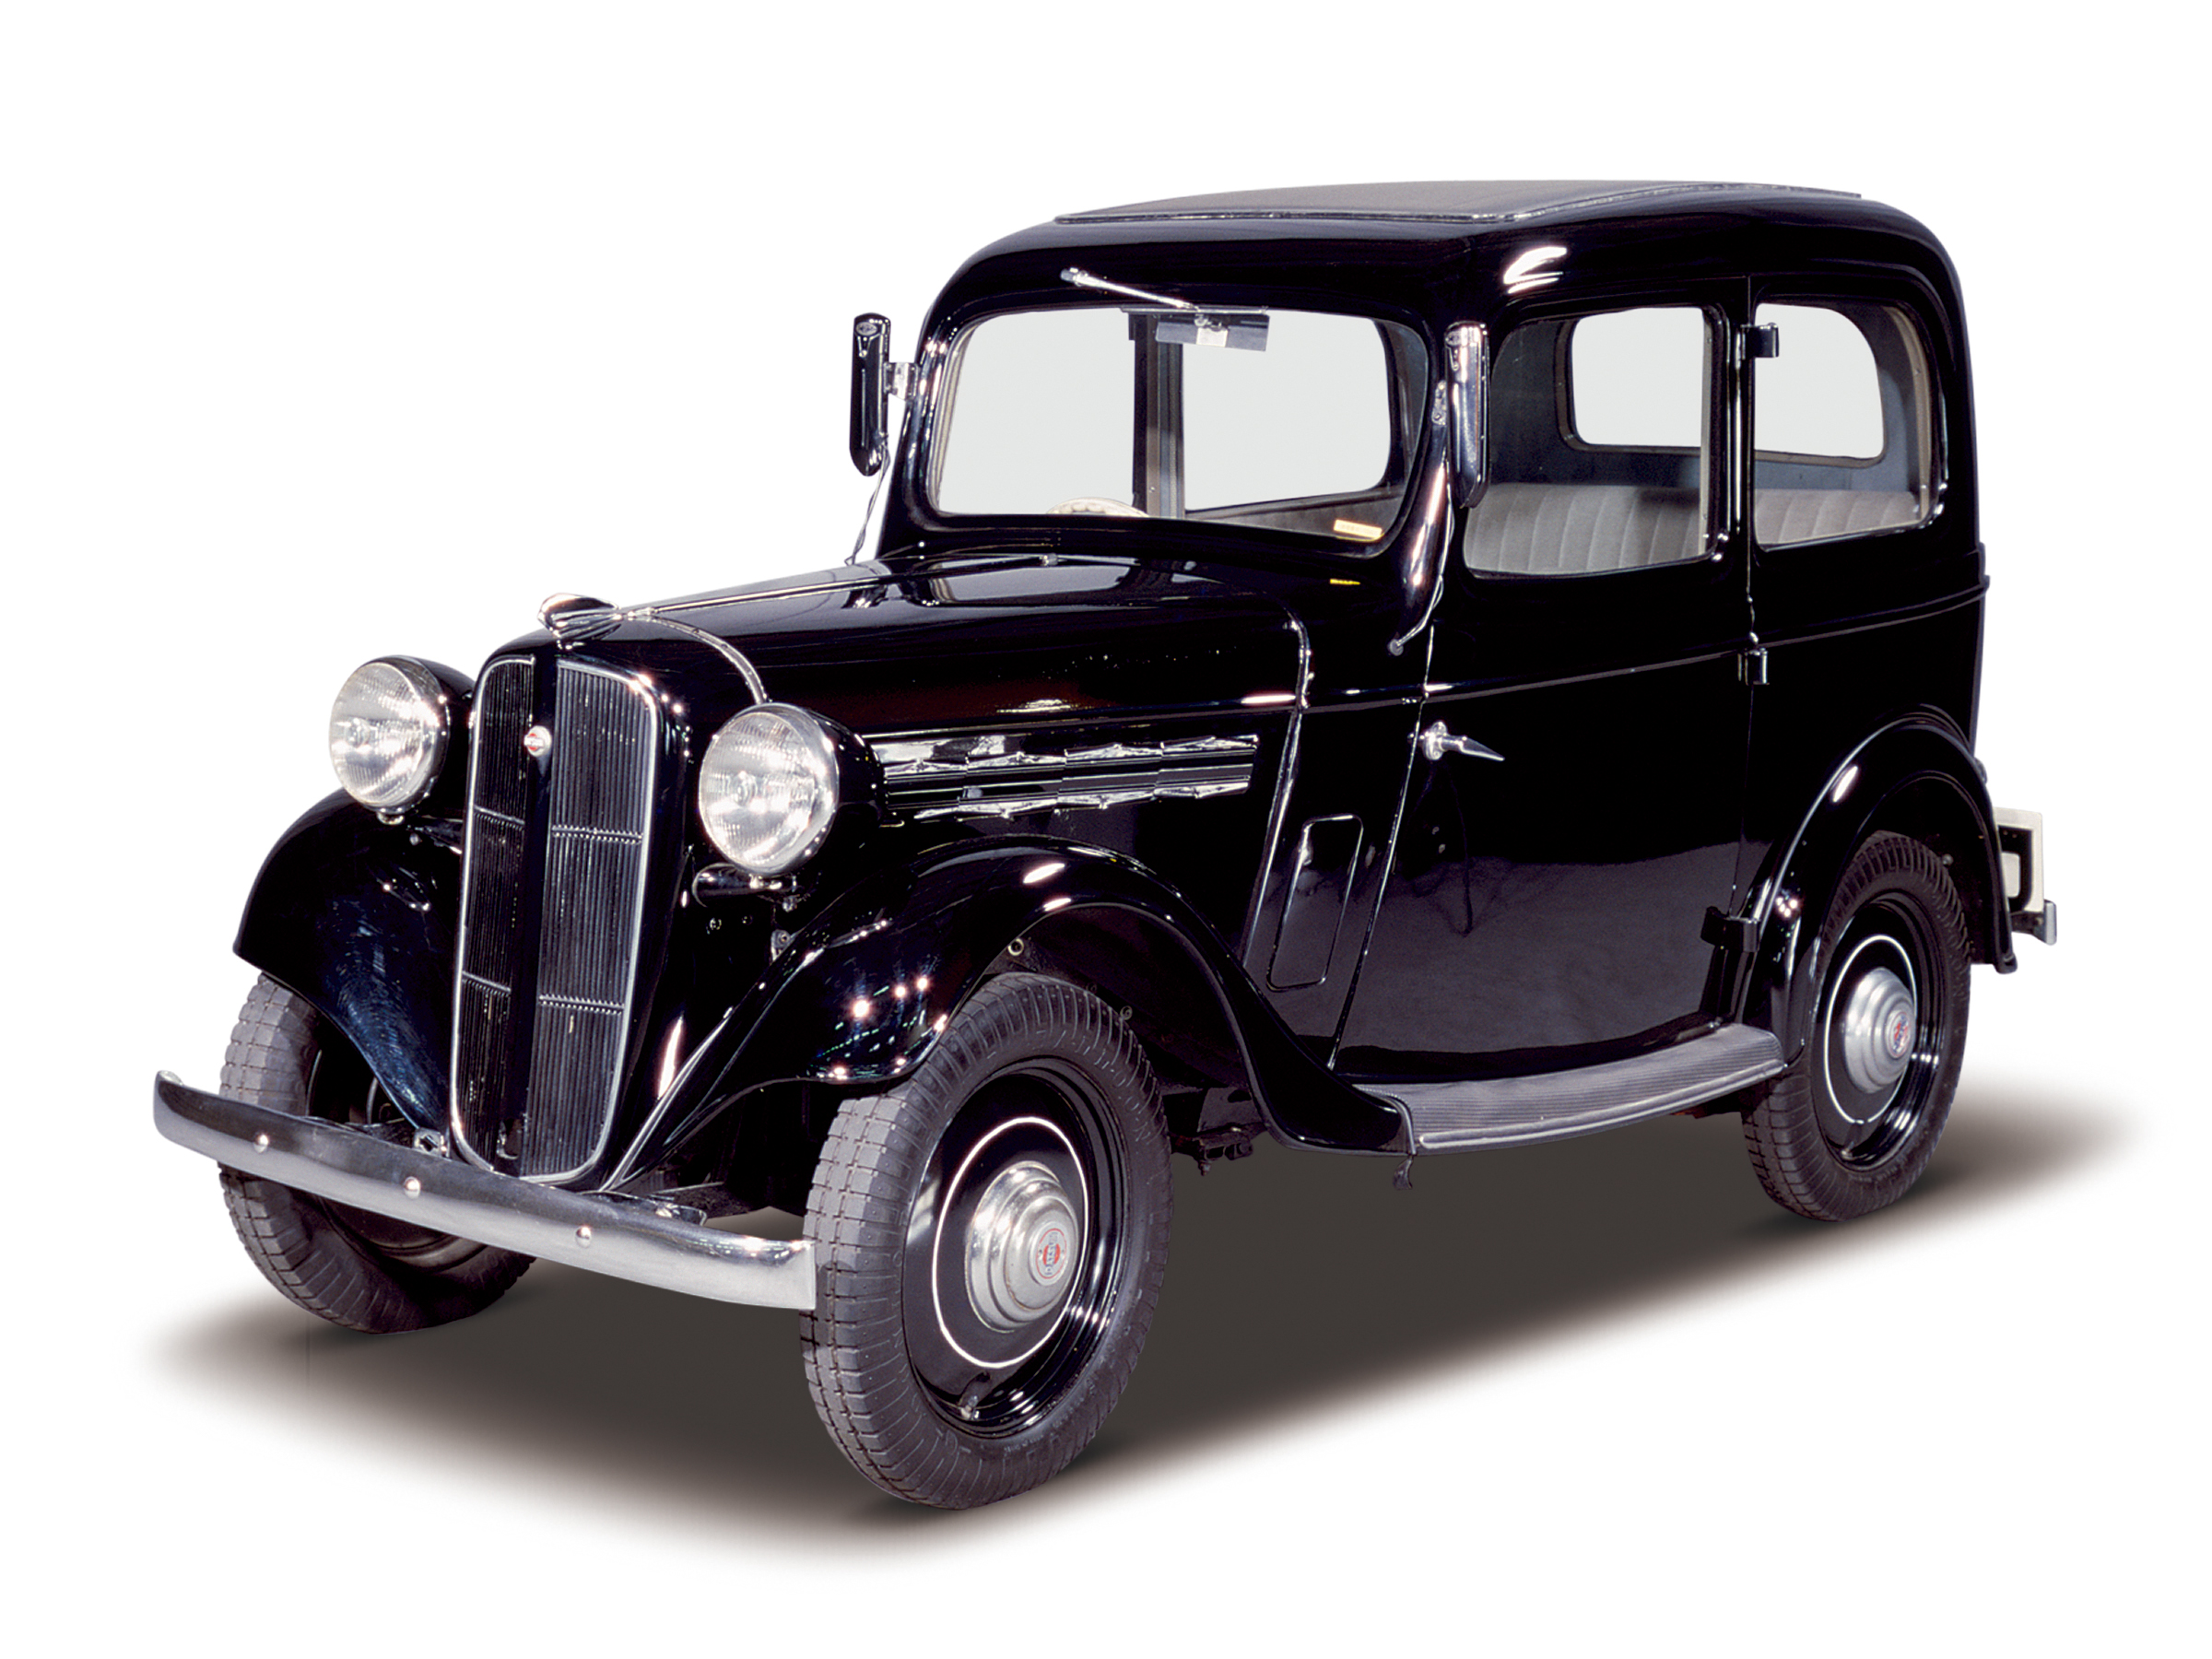 Nissan Heritage Collection Datsun 17 Sedan